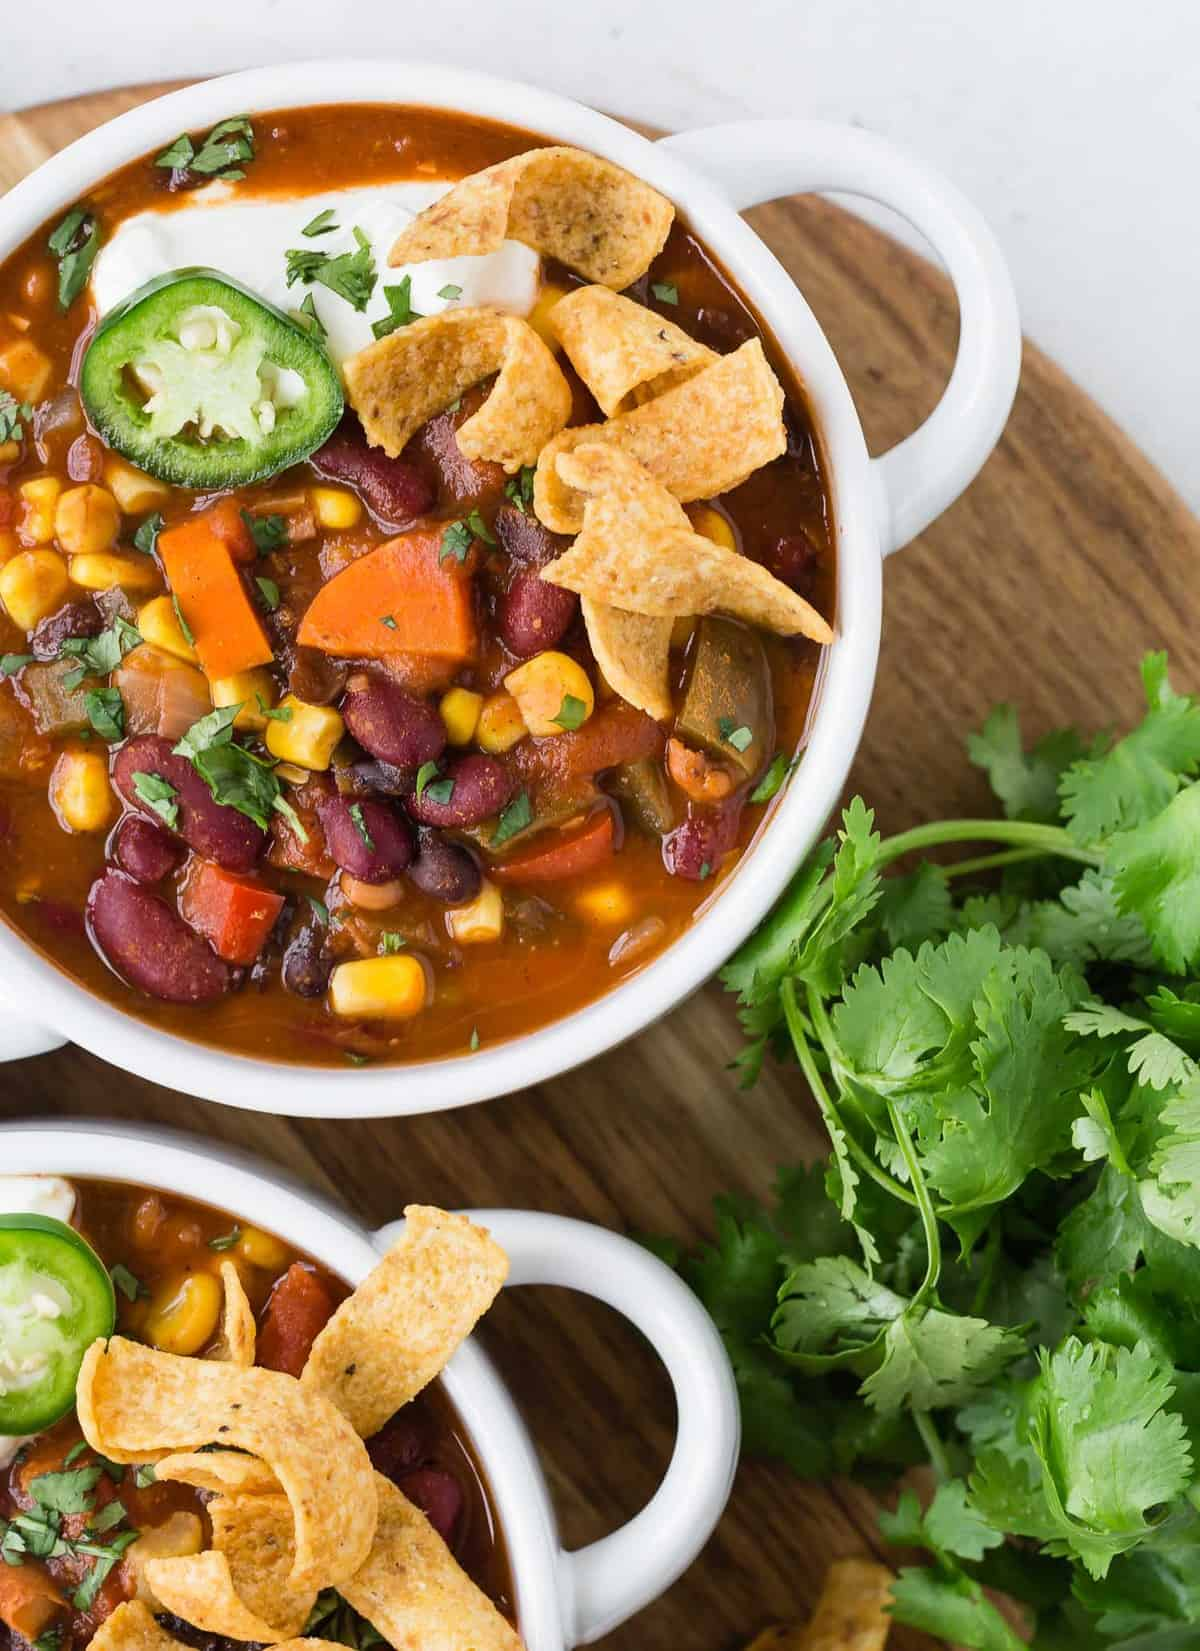 Vegetarian chili with fritos, jalapeno, sour cream, and cilantro.